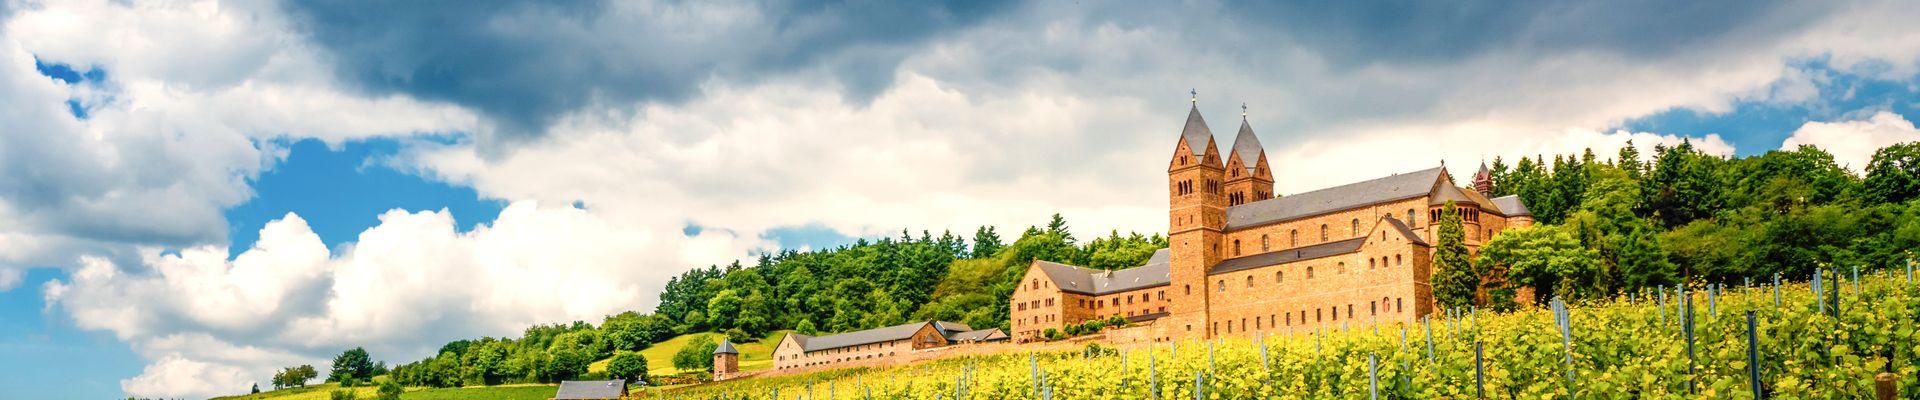 Kurzurlaub in Hessen